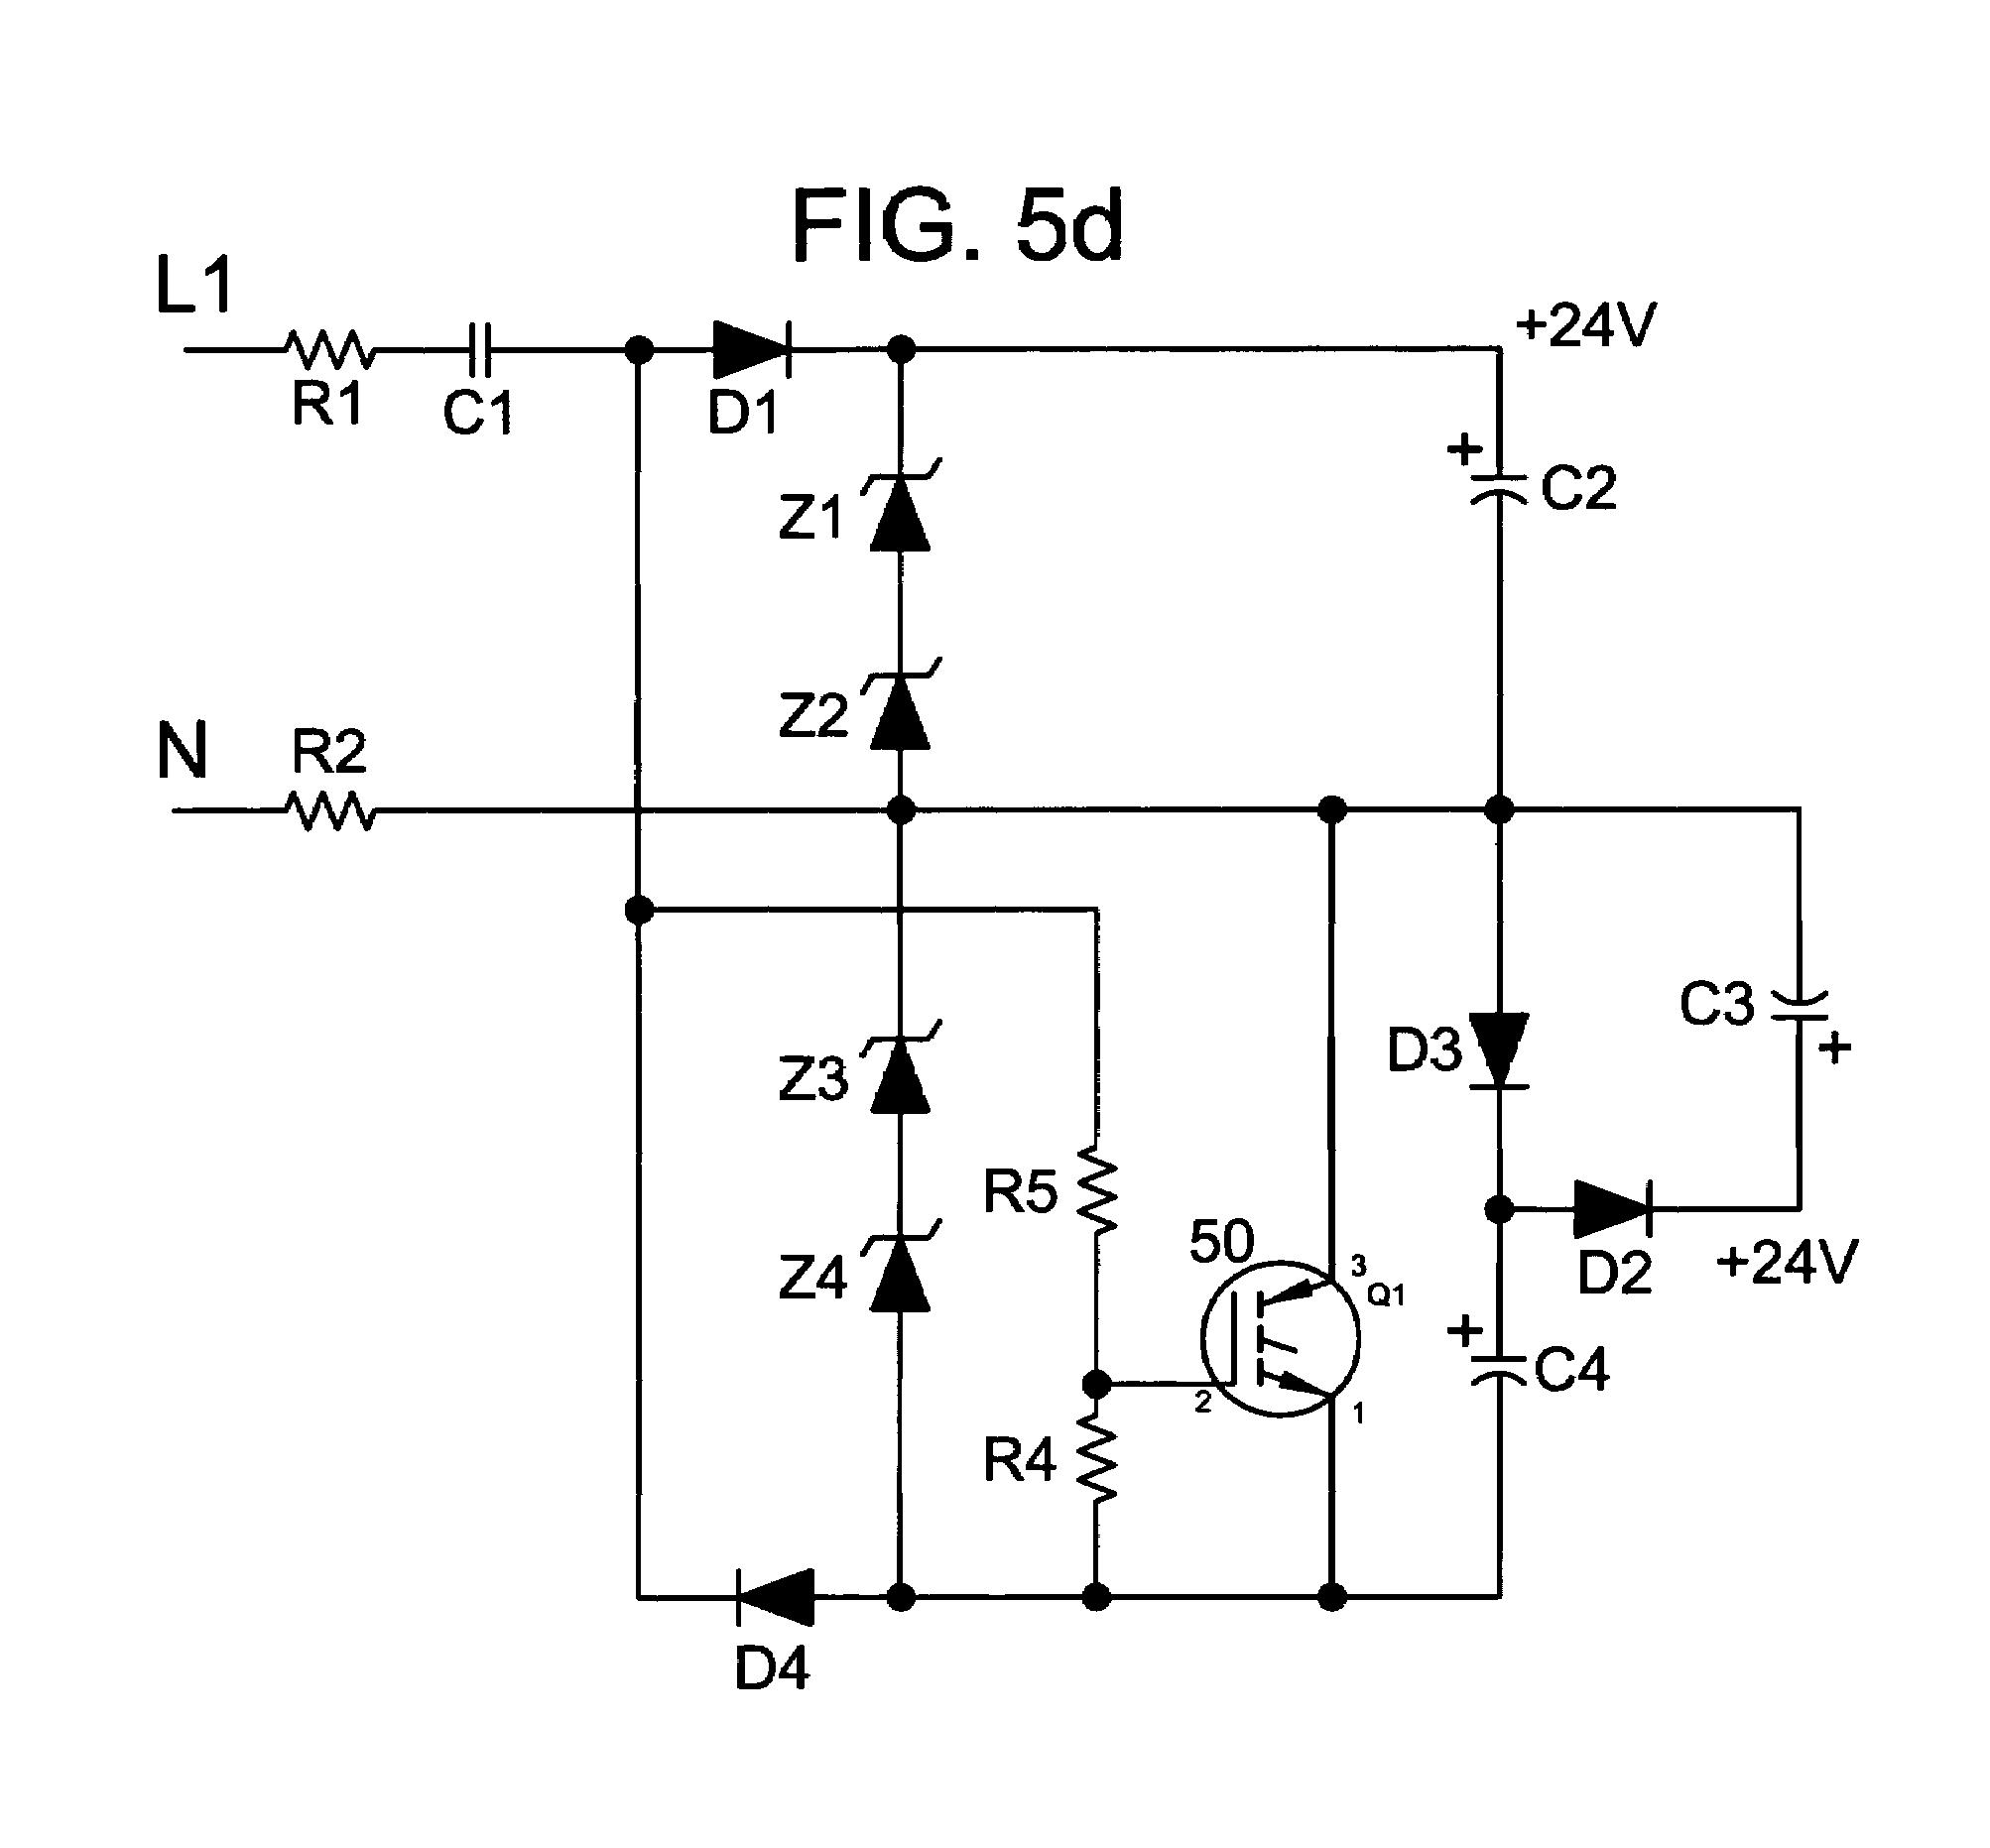 Snap 24v Transformerless Power Supply Circuit Diagram Wiring